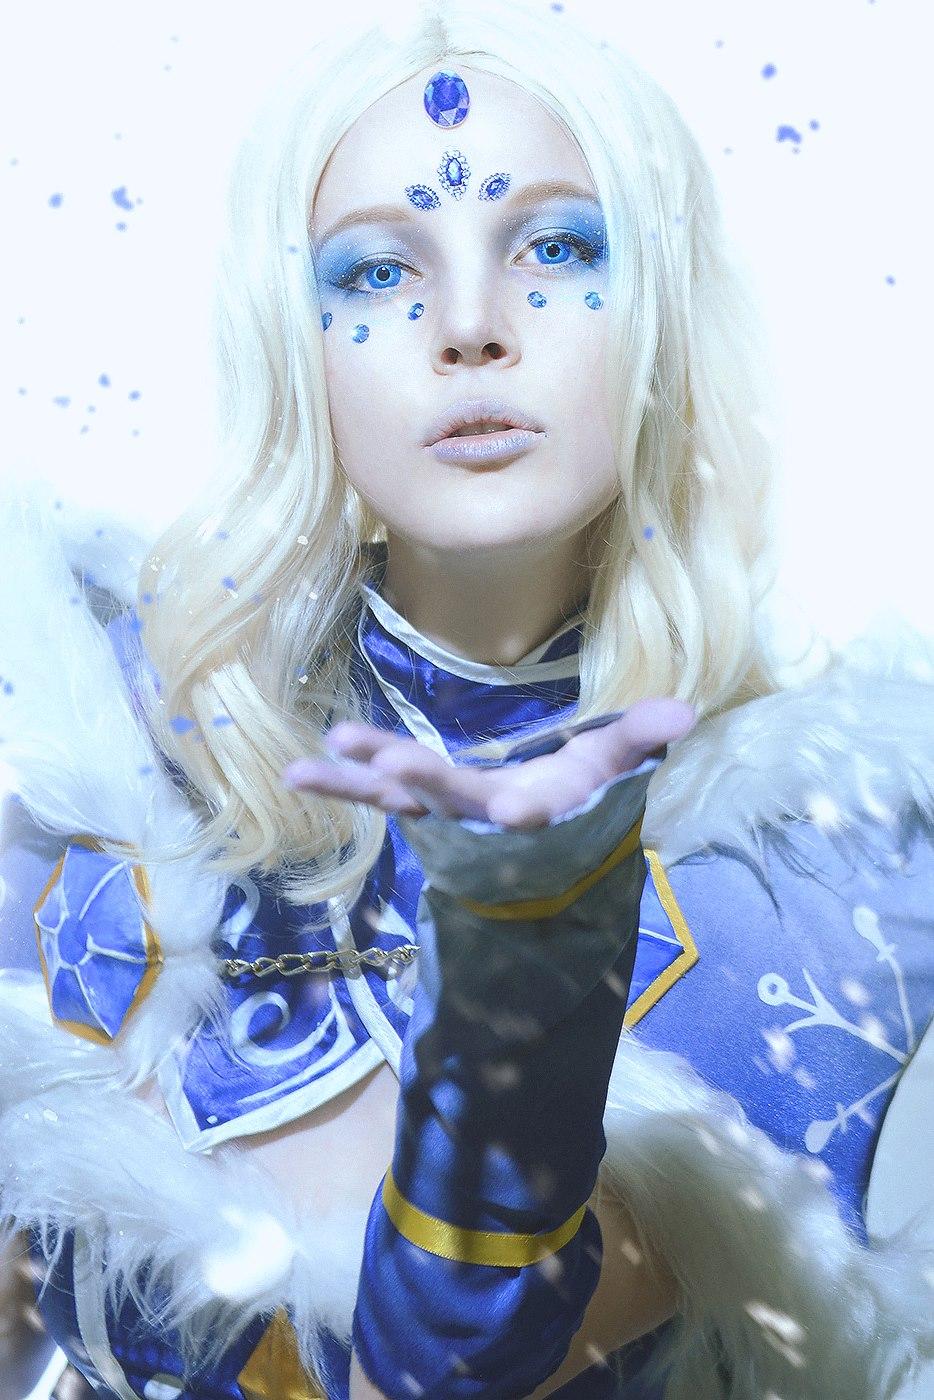 Dota 2 crystal maiden cosplay